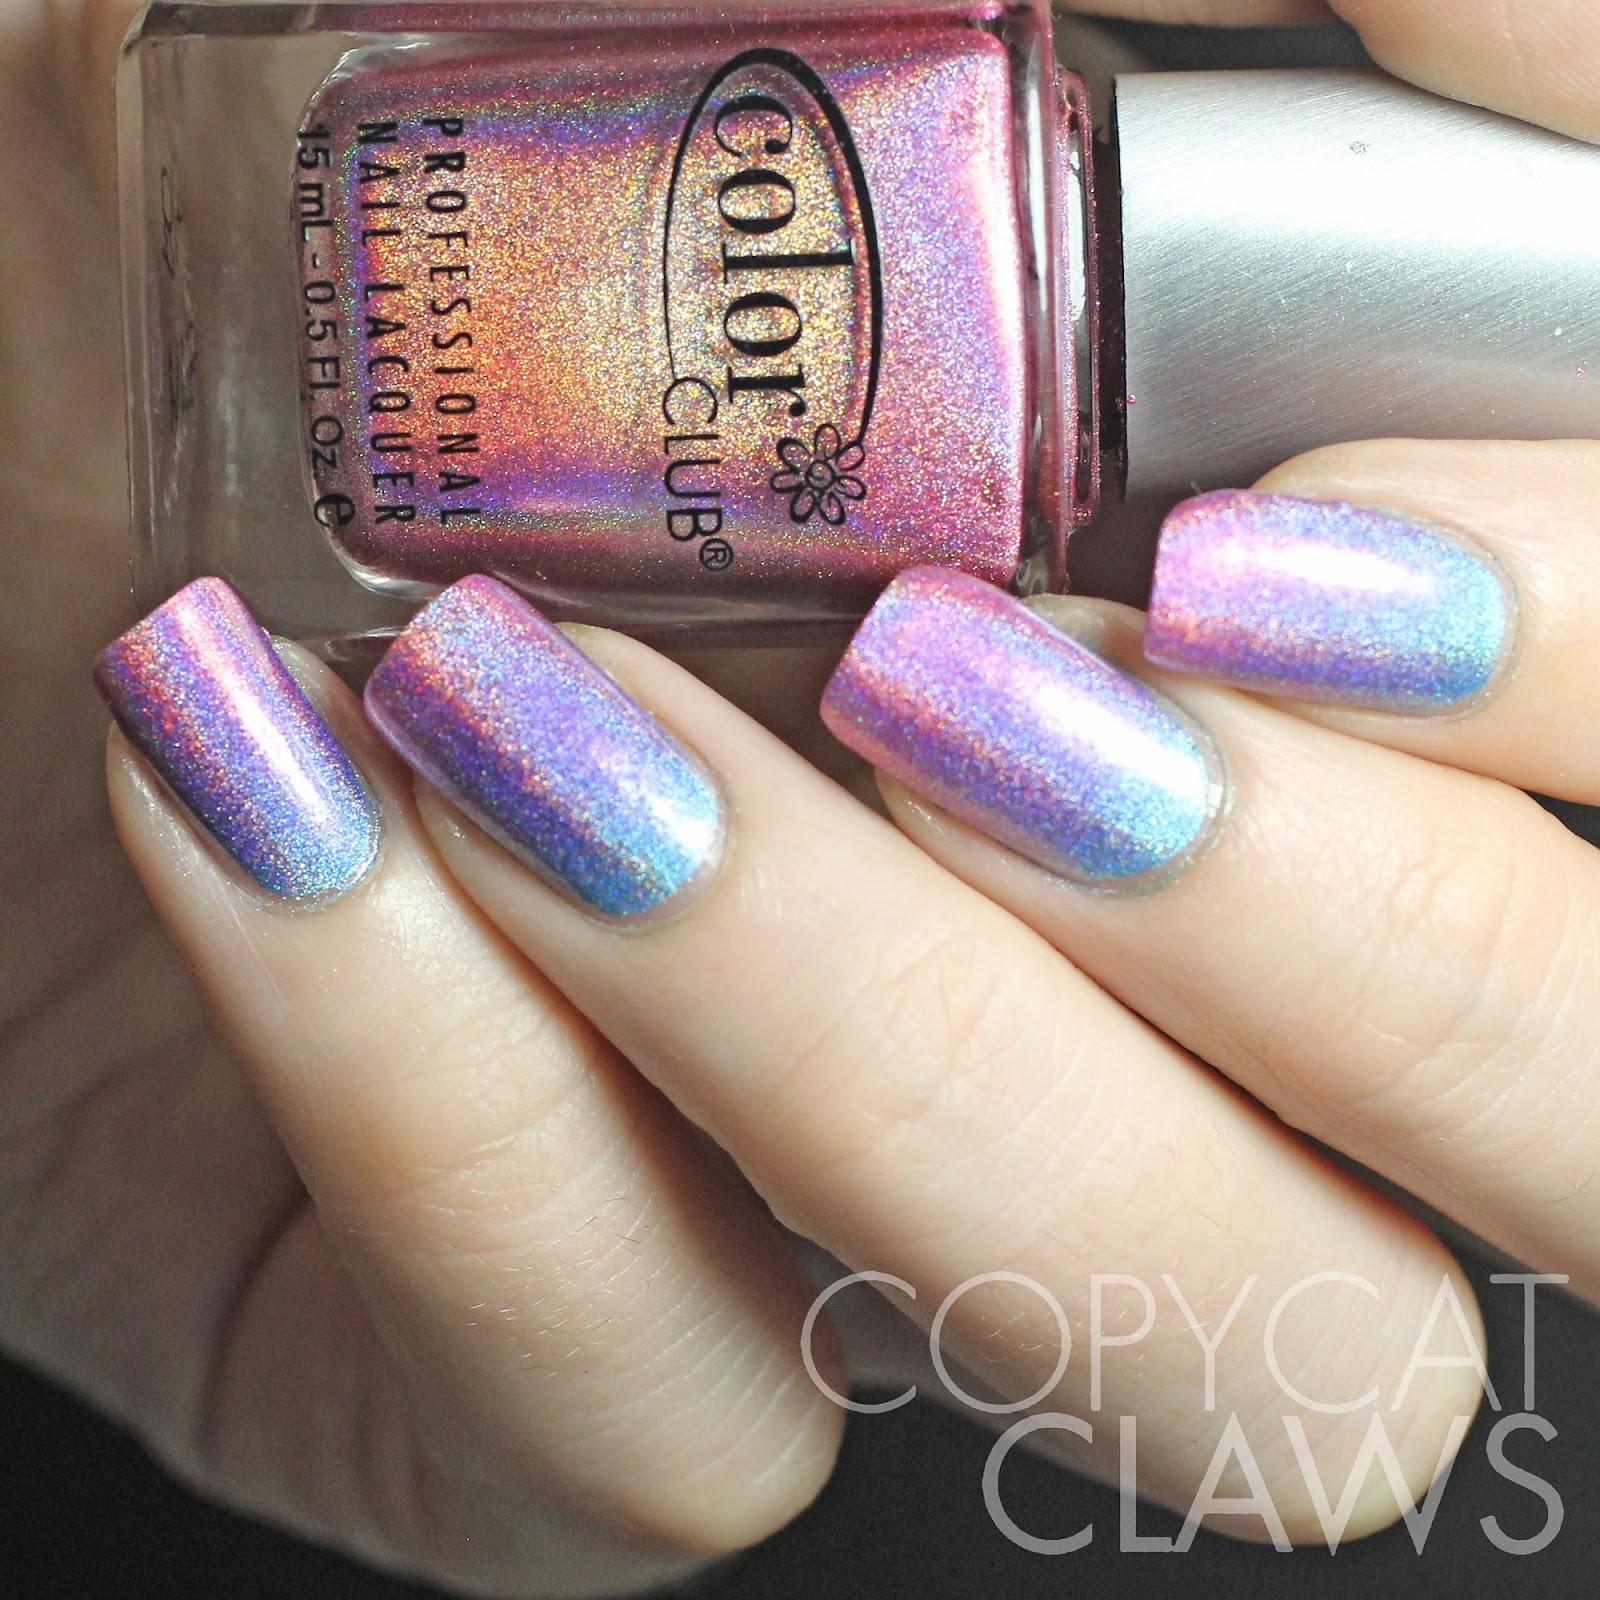 Copycat Claws: Color Club Holographic Gradient